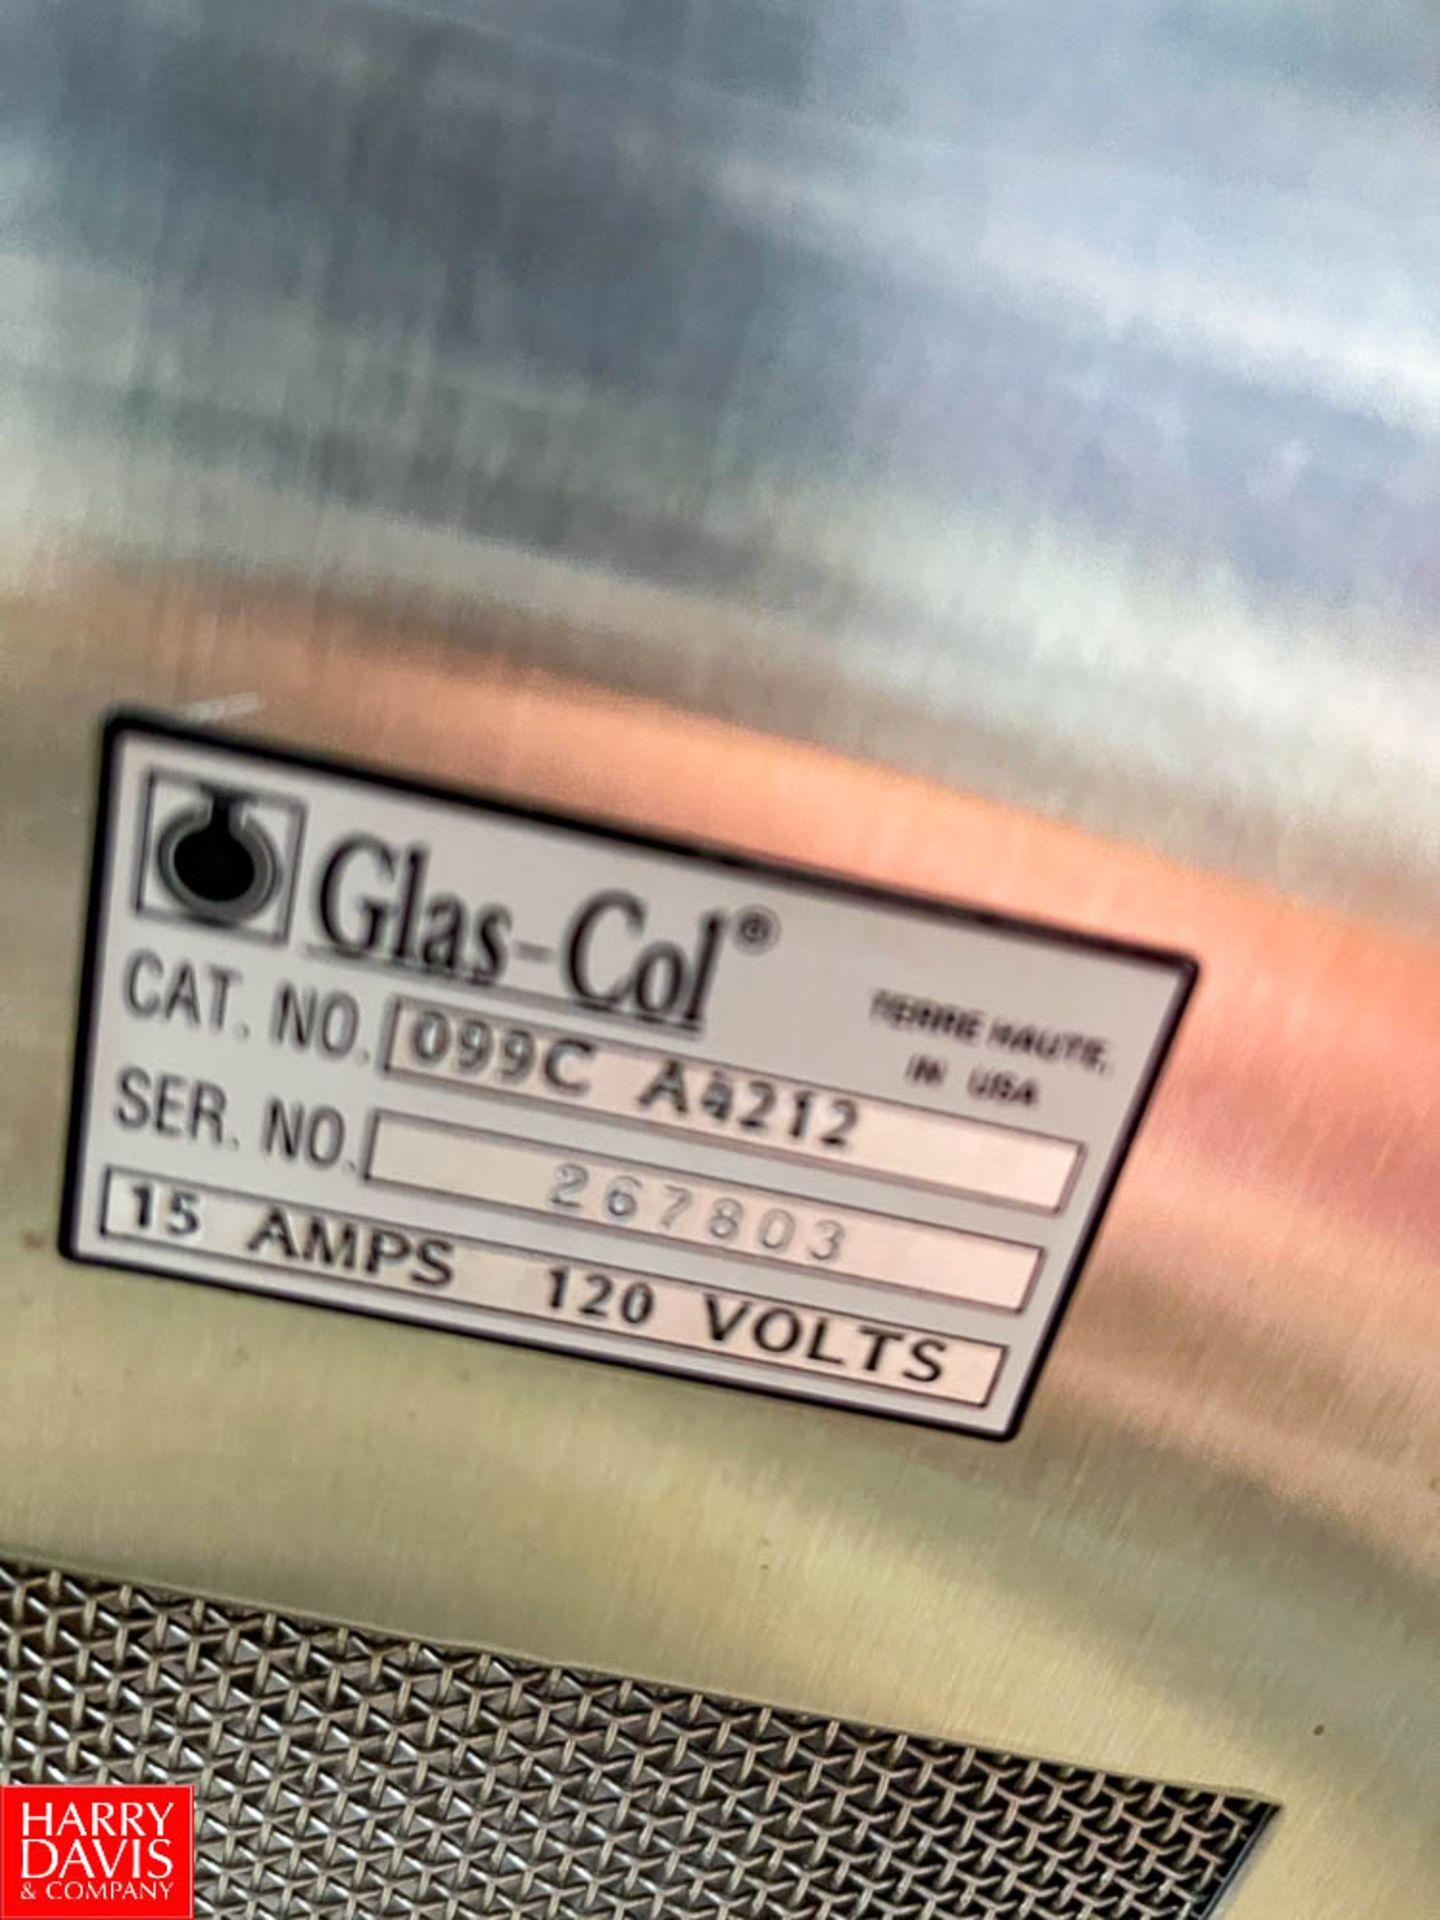 Glas-Col Model 099C A4212 - Image 3 of 4